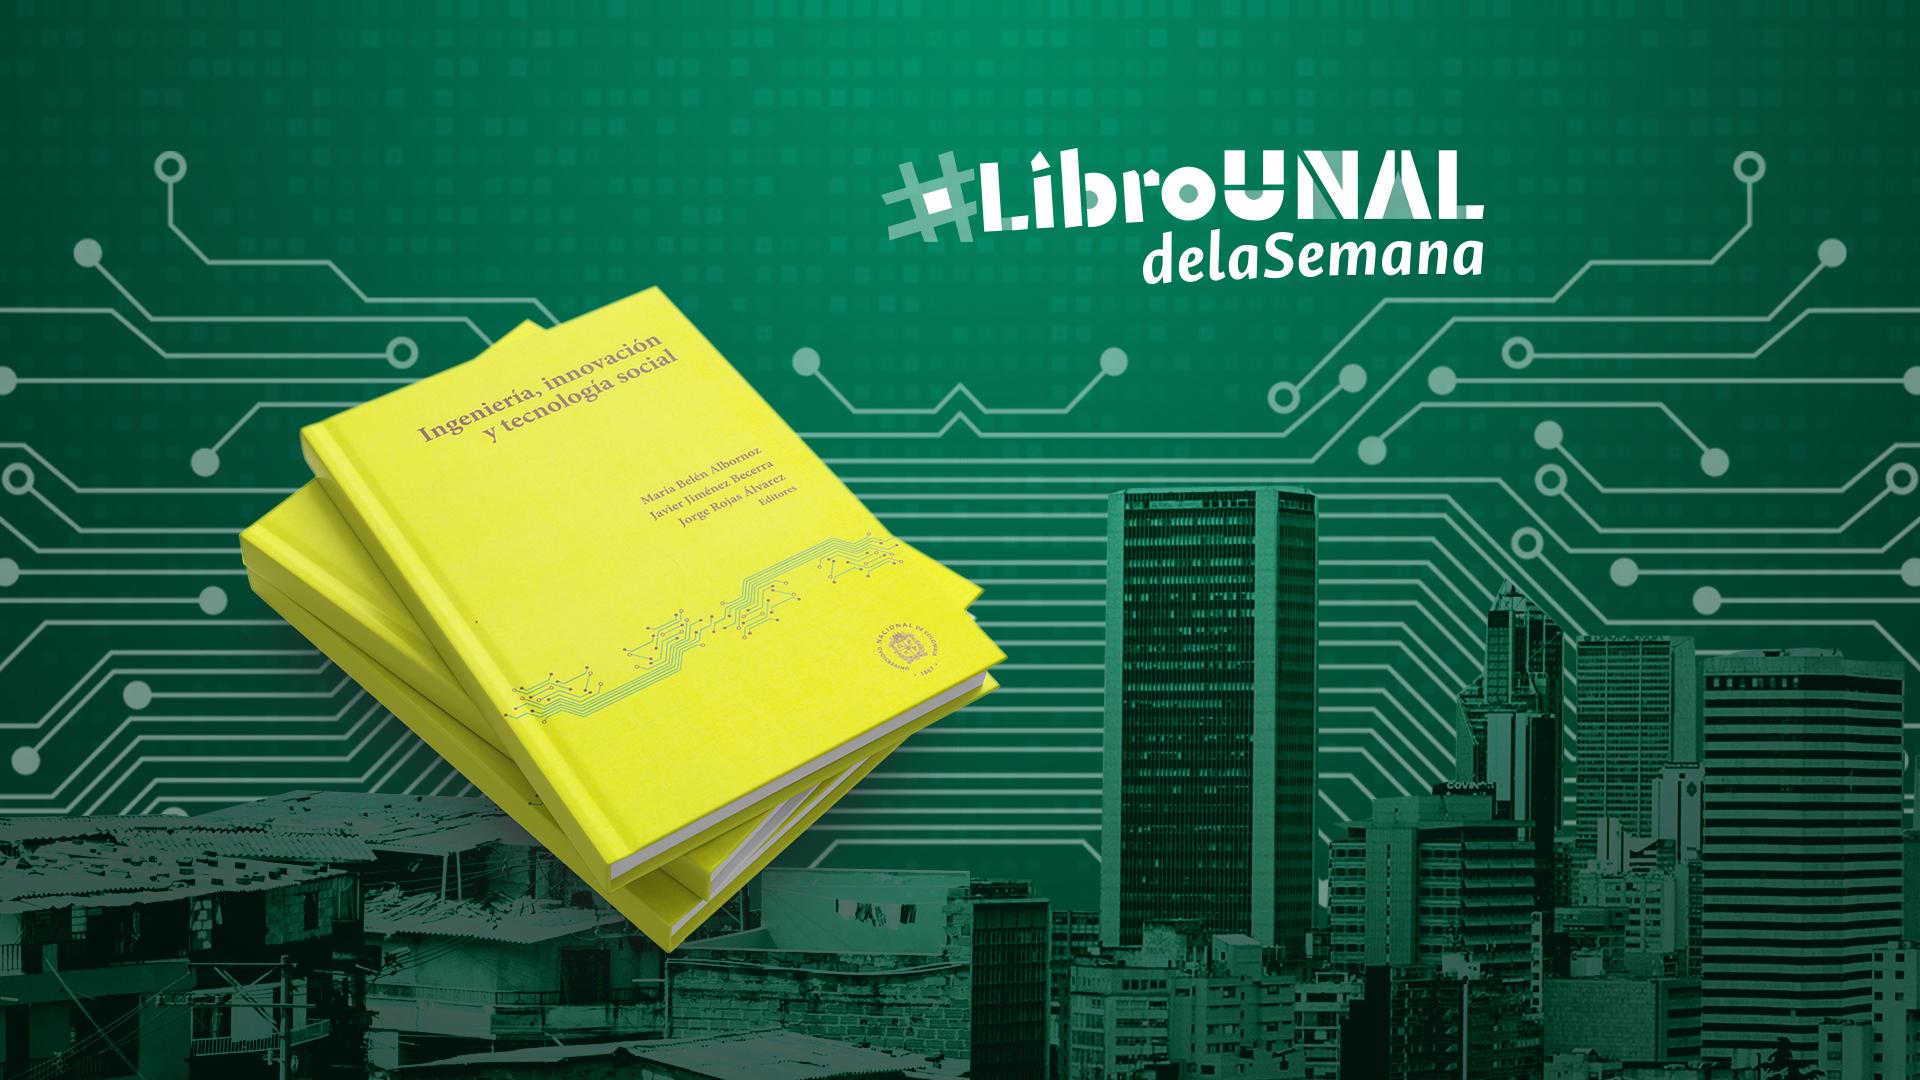 Editorial UNAL